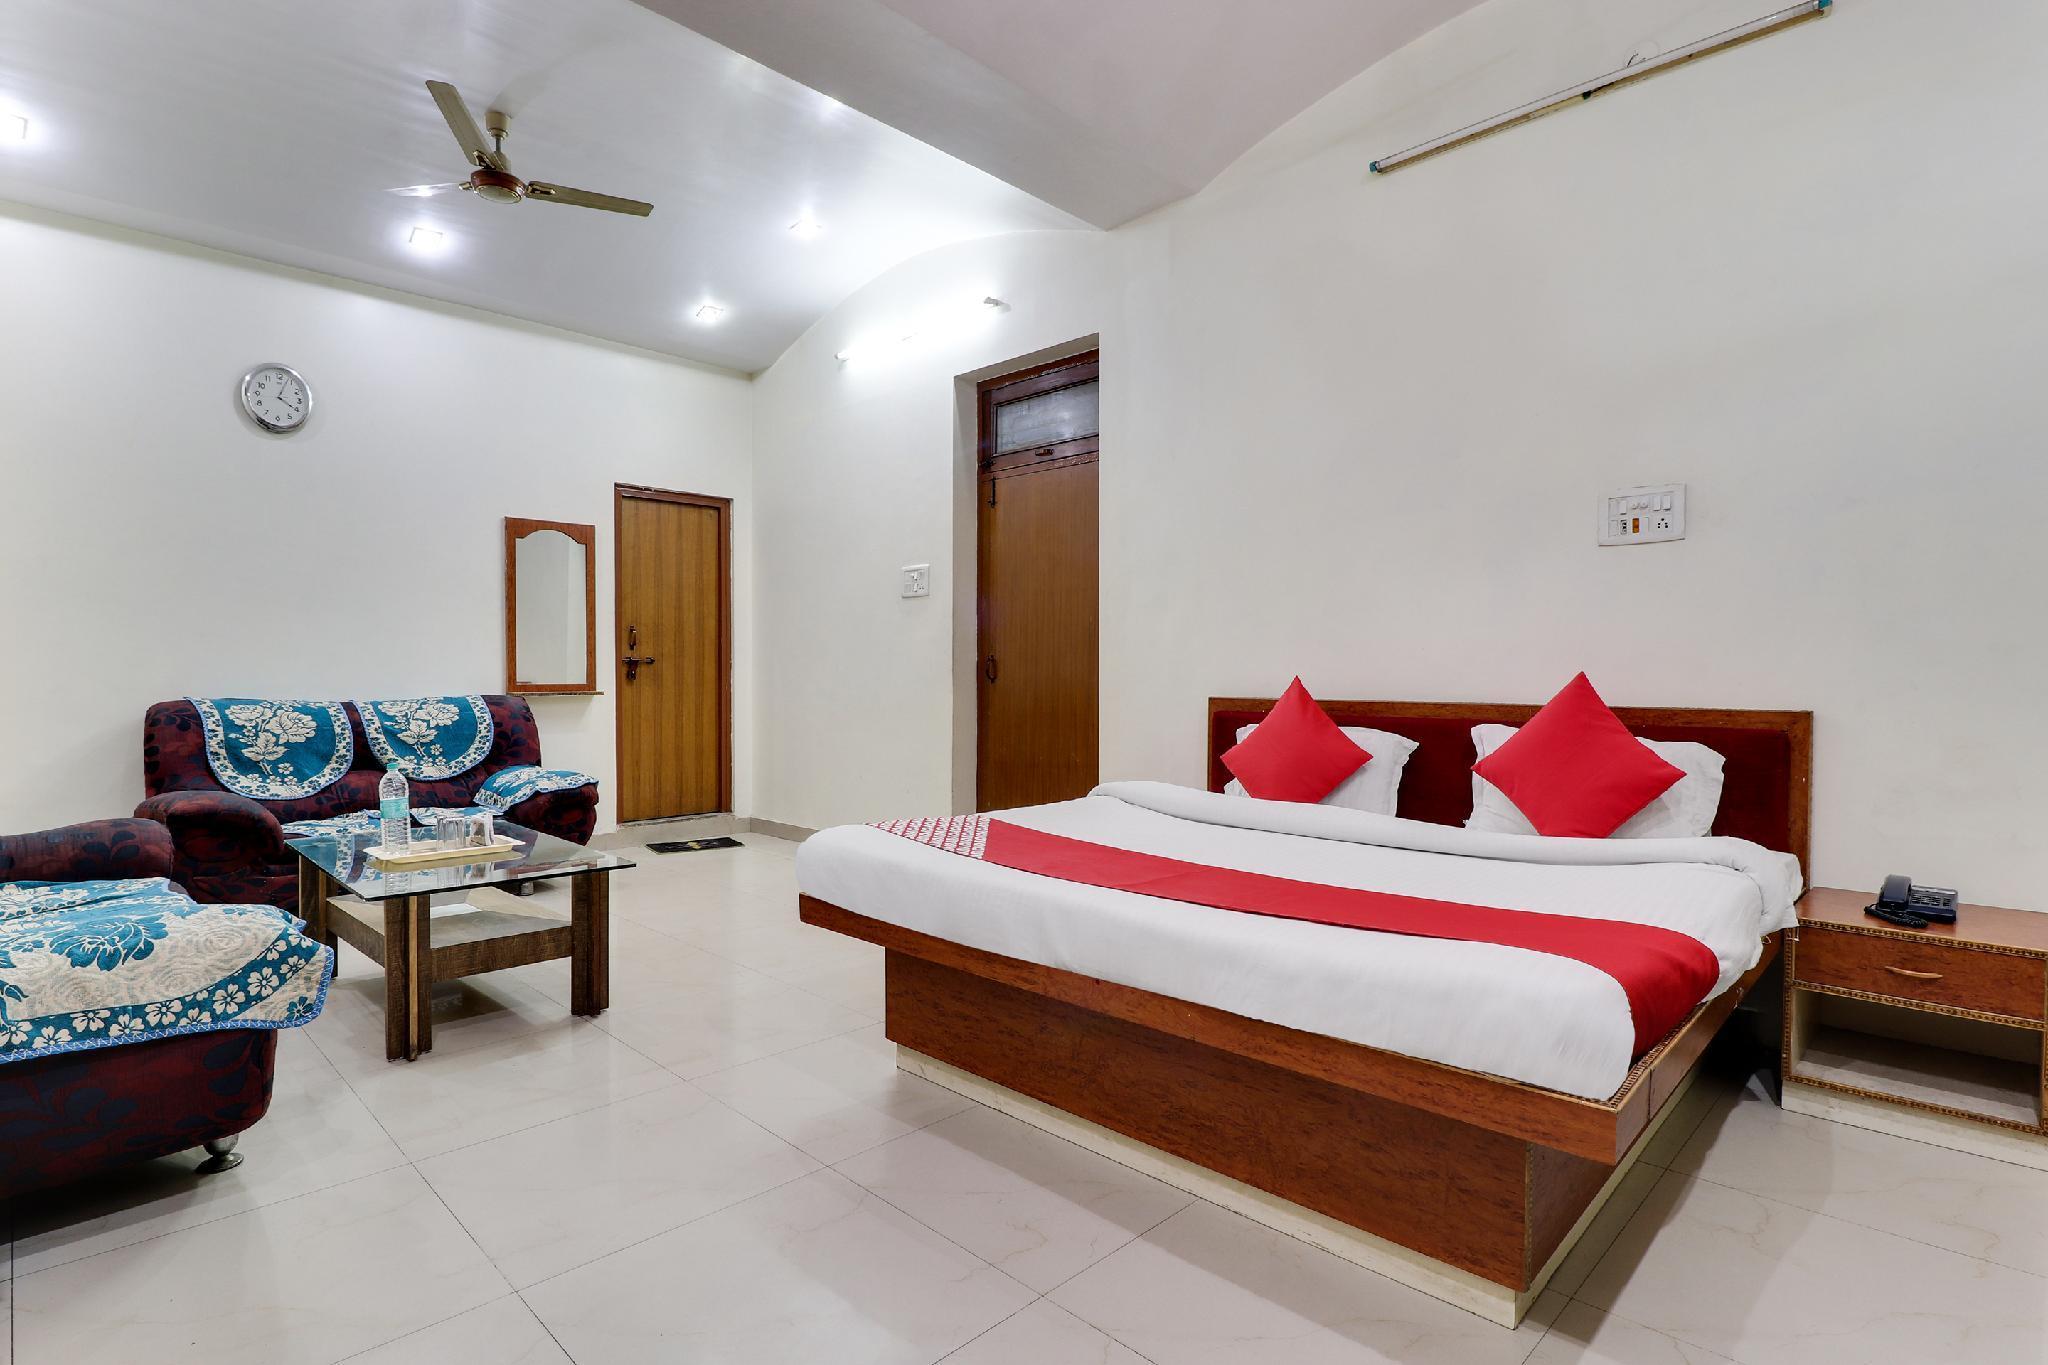 OYO 43936 Hotel Rajputana Palace